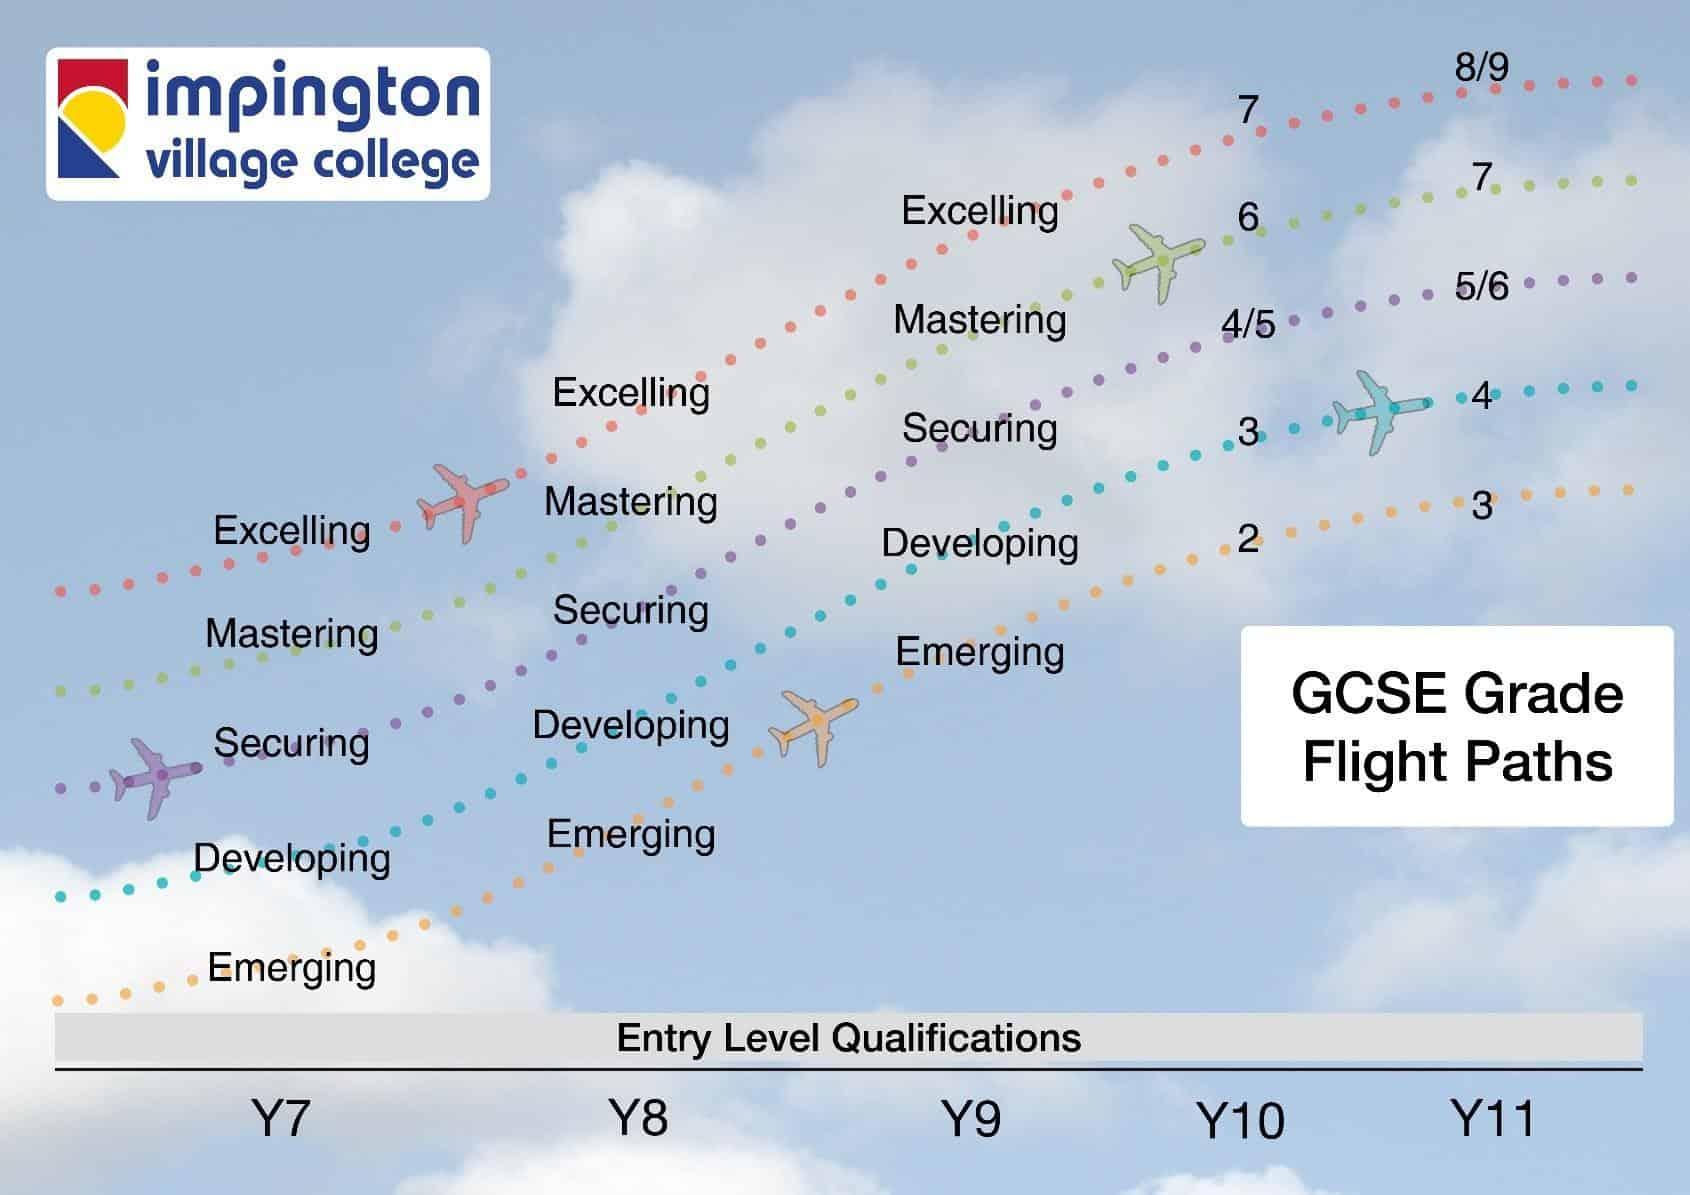 GCSE Grade Flight Paths image